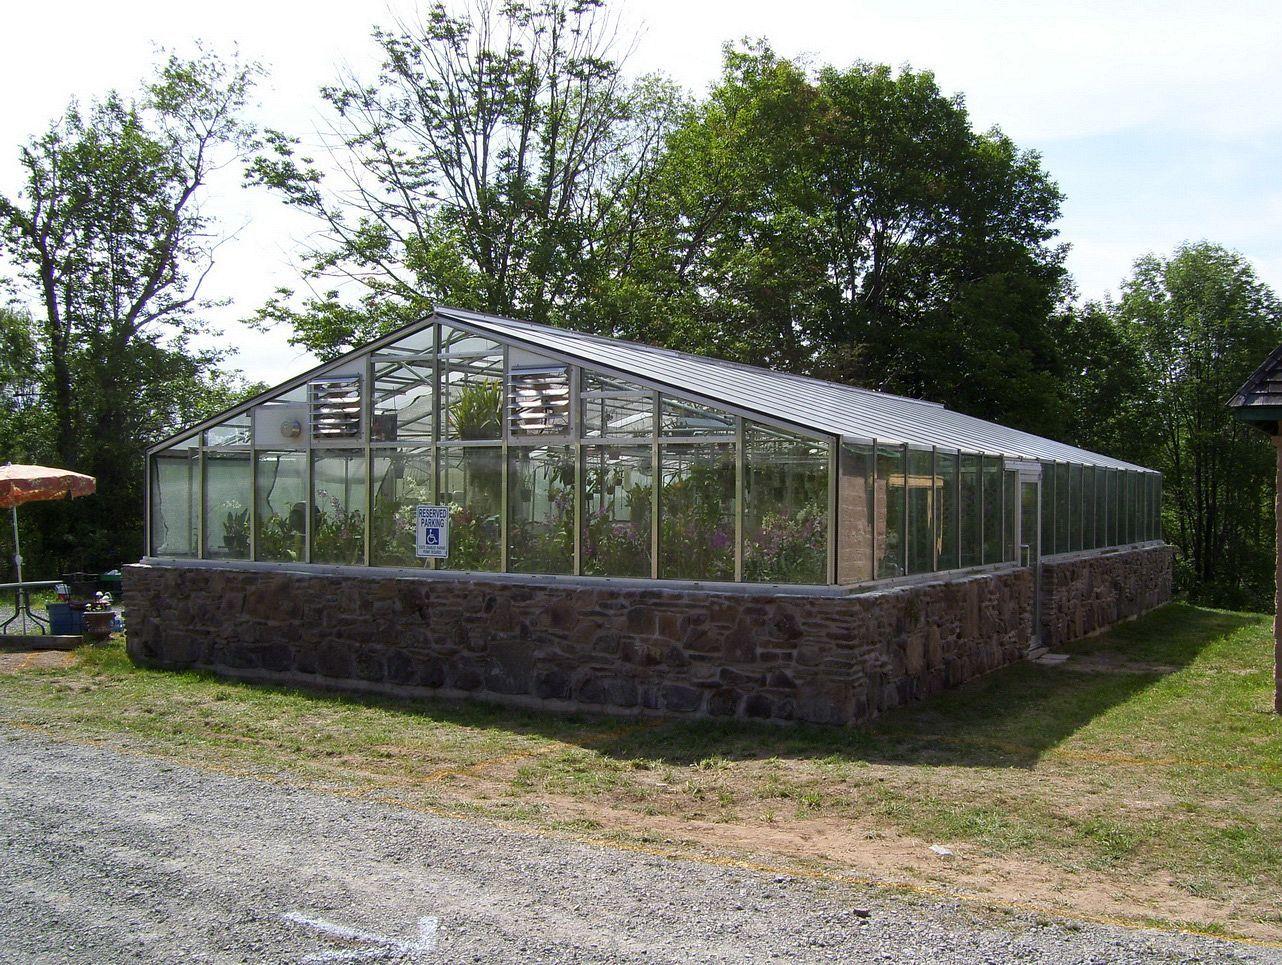 60 awesome small greenhouse for backyard ideas ideas backyards